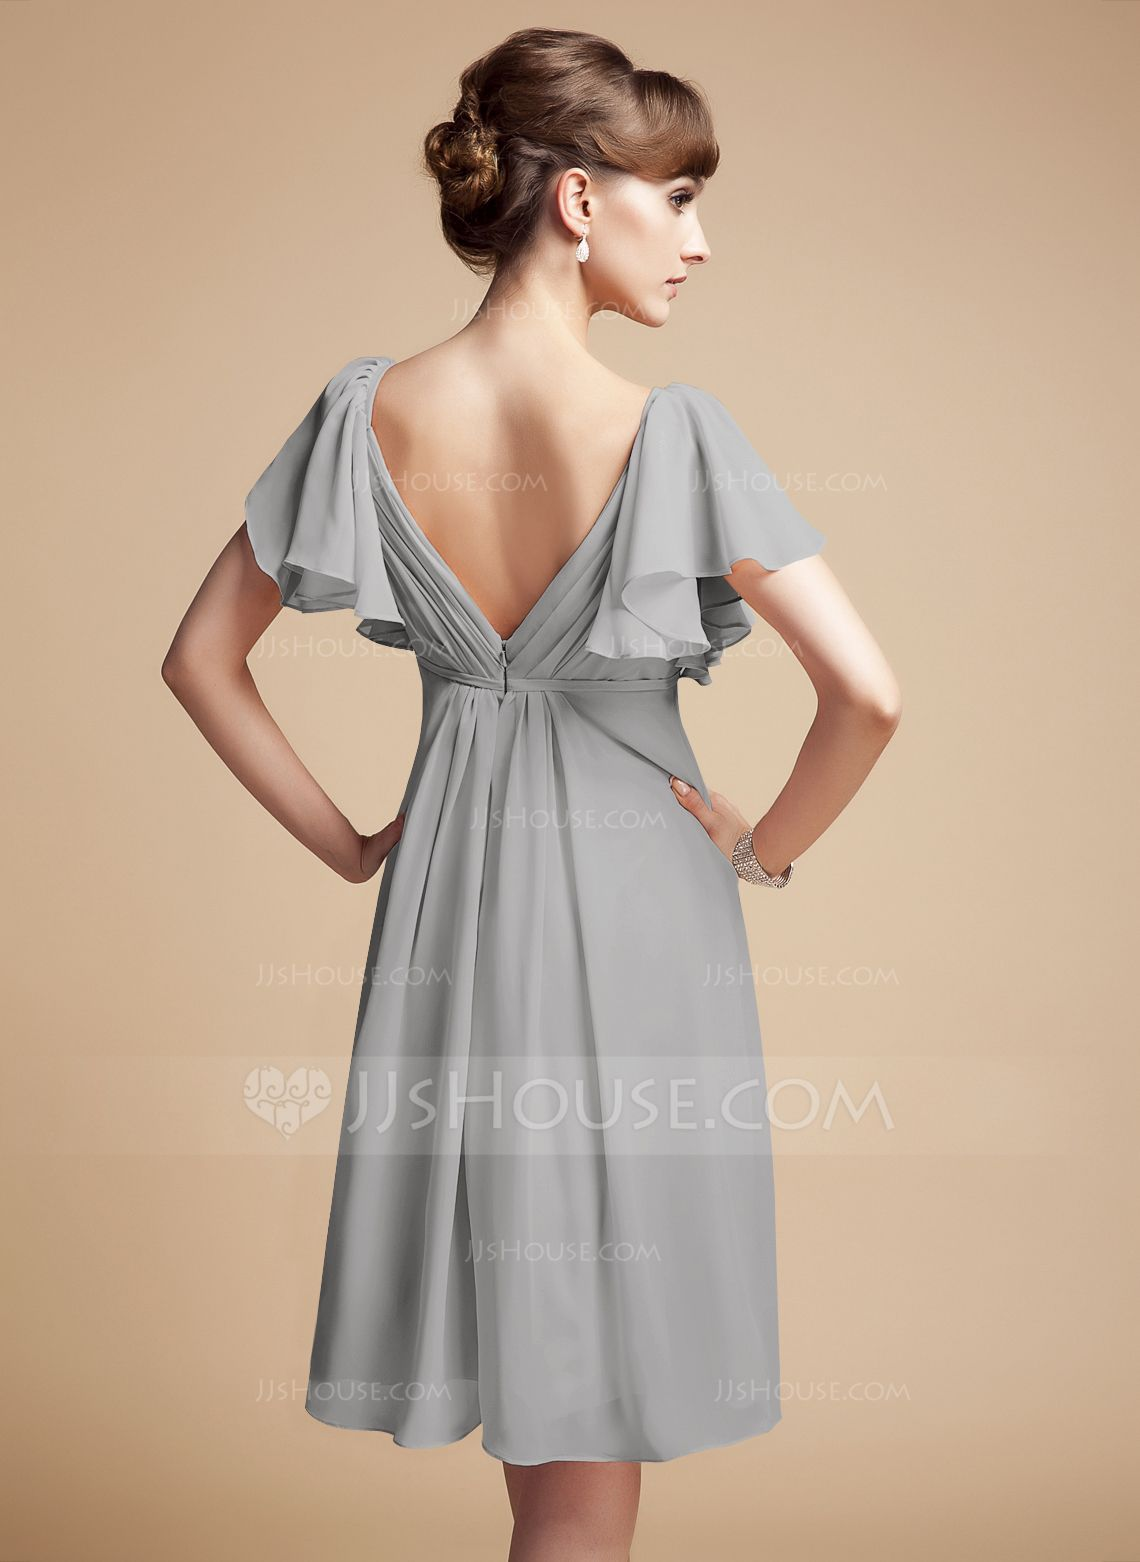 Empire sweetheart kneelength chiffon bridesmaid dress with